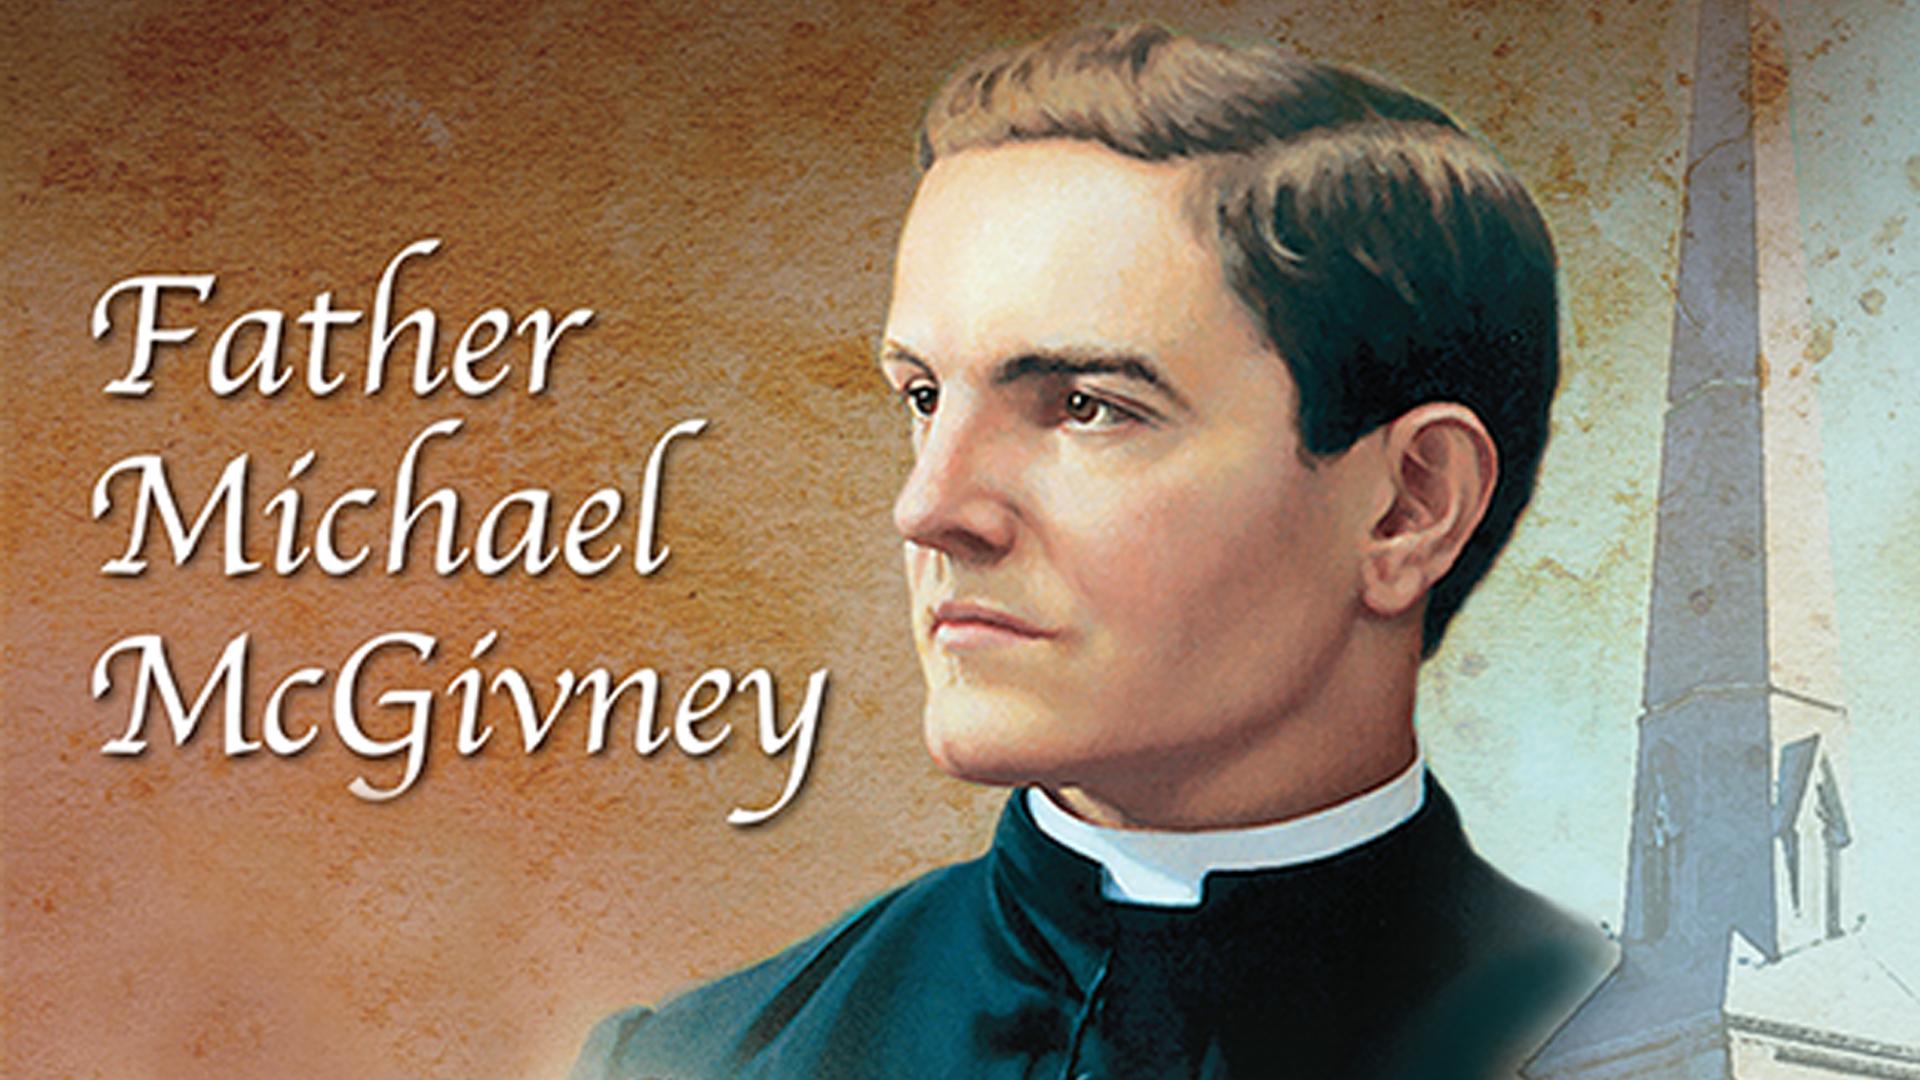 Father Michael McGivney